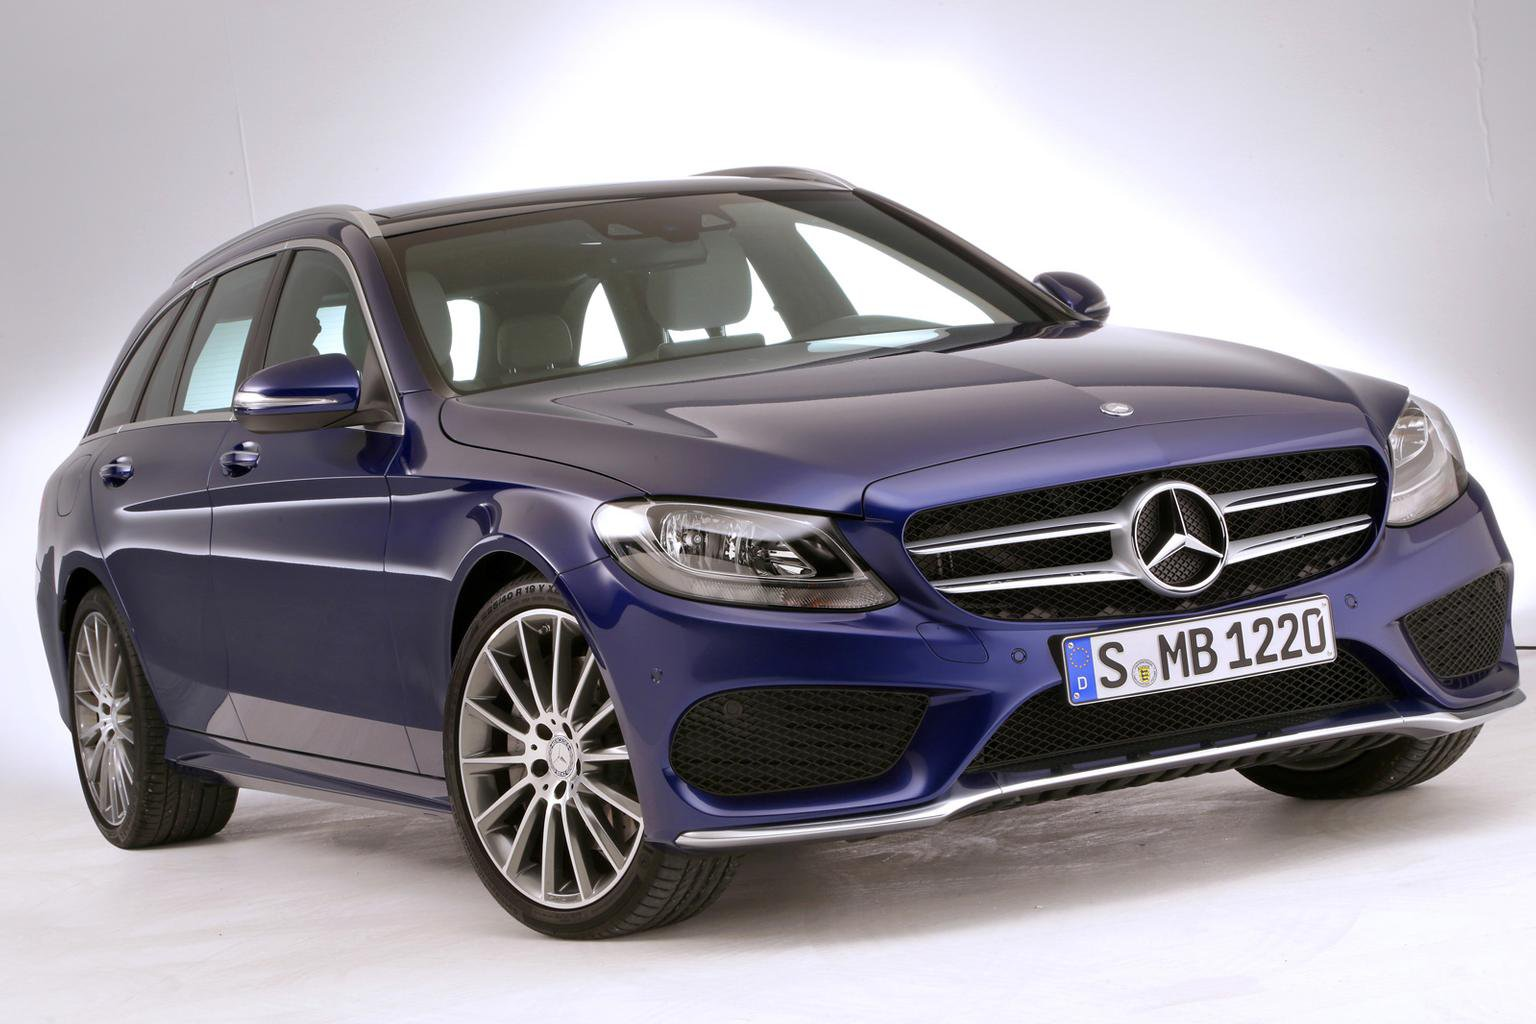 2014 Mercedes C-Class Estate revealed